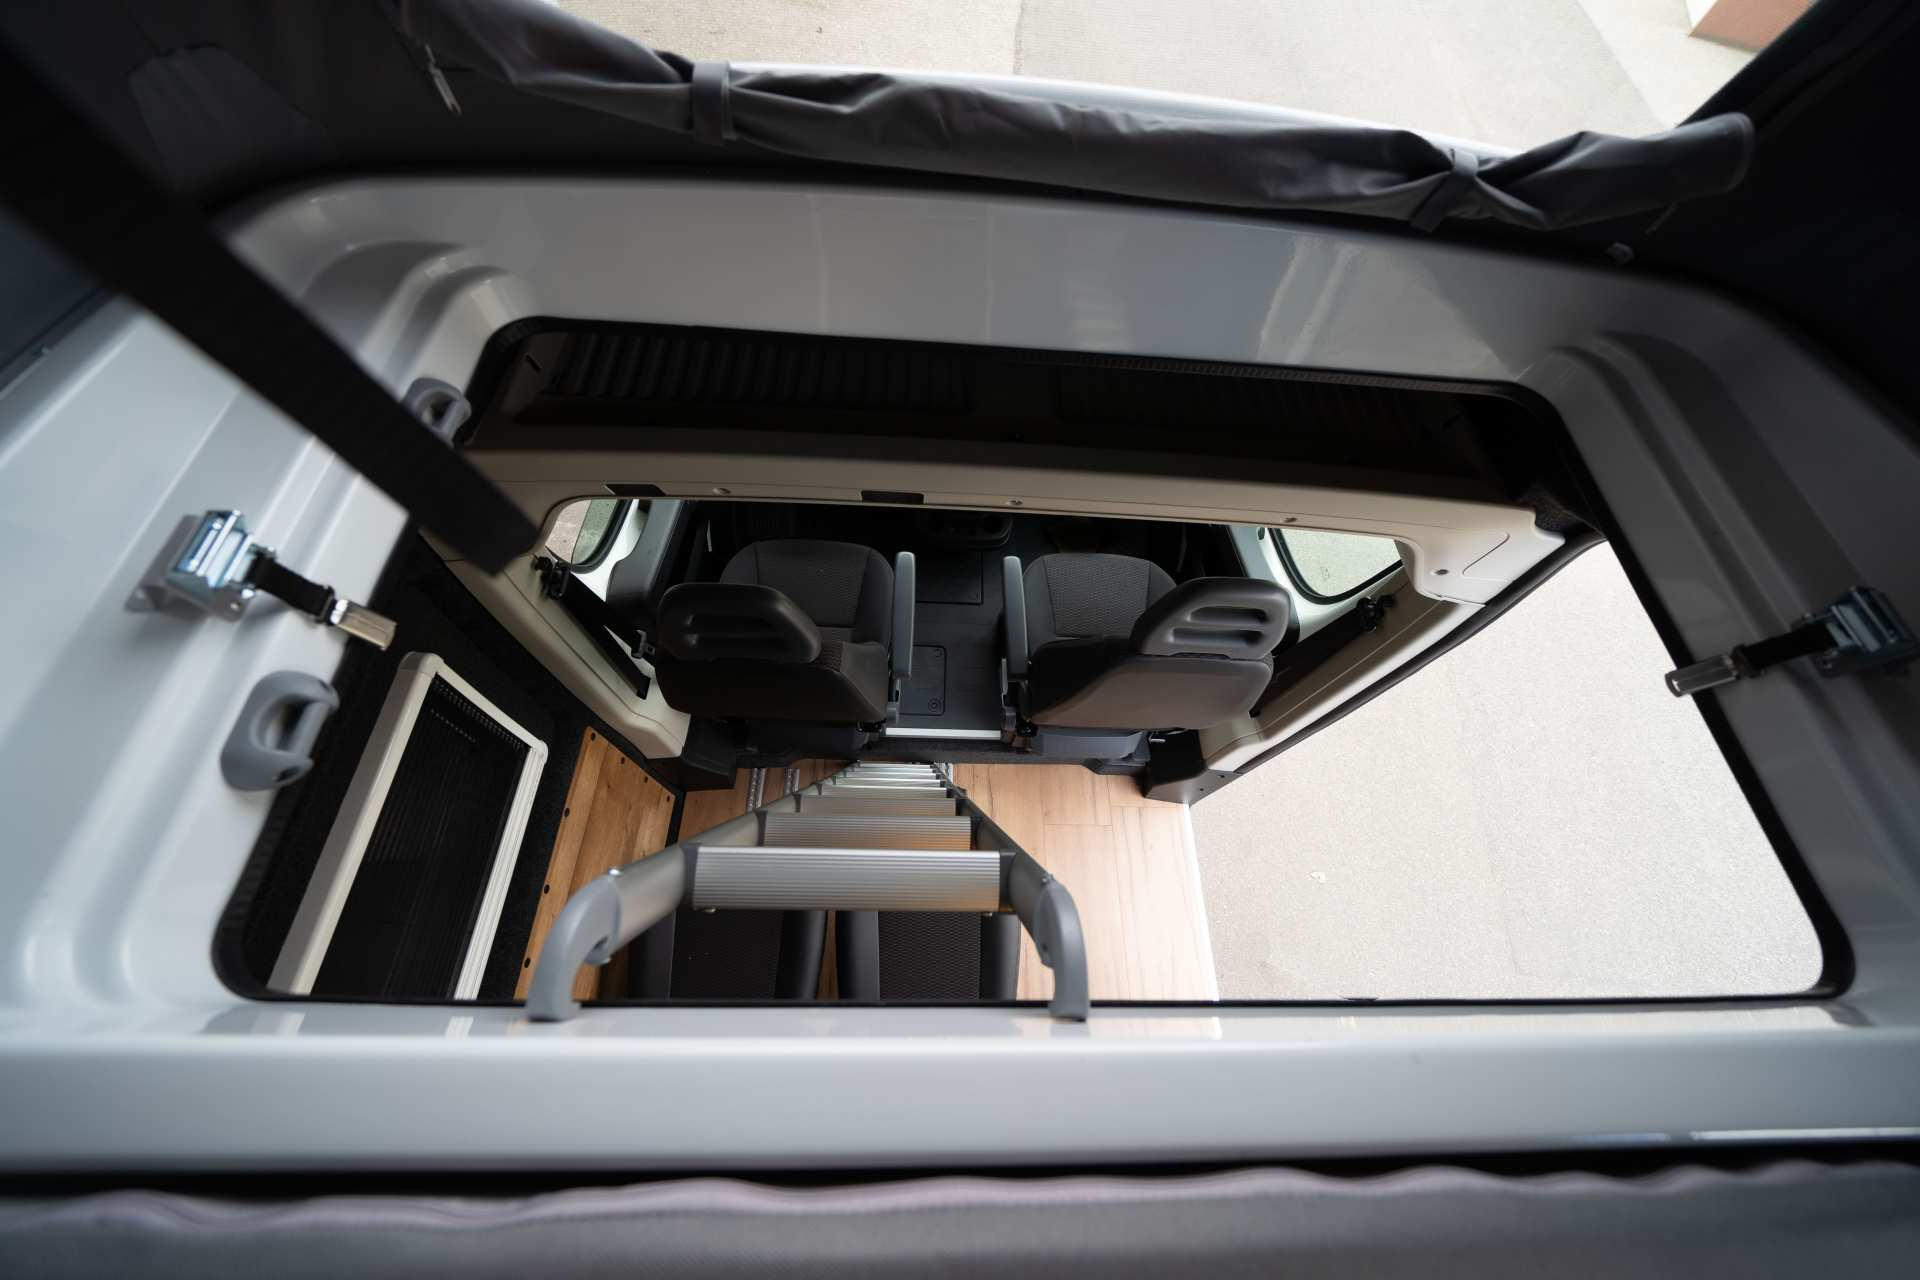 Individualausbau: Zwei-Raumwohnung Peugeot Boxer L2 H2 - 22